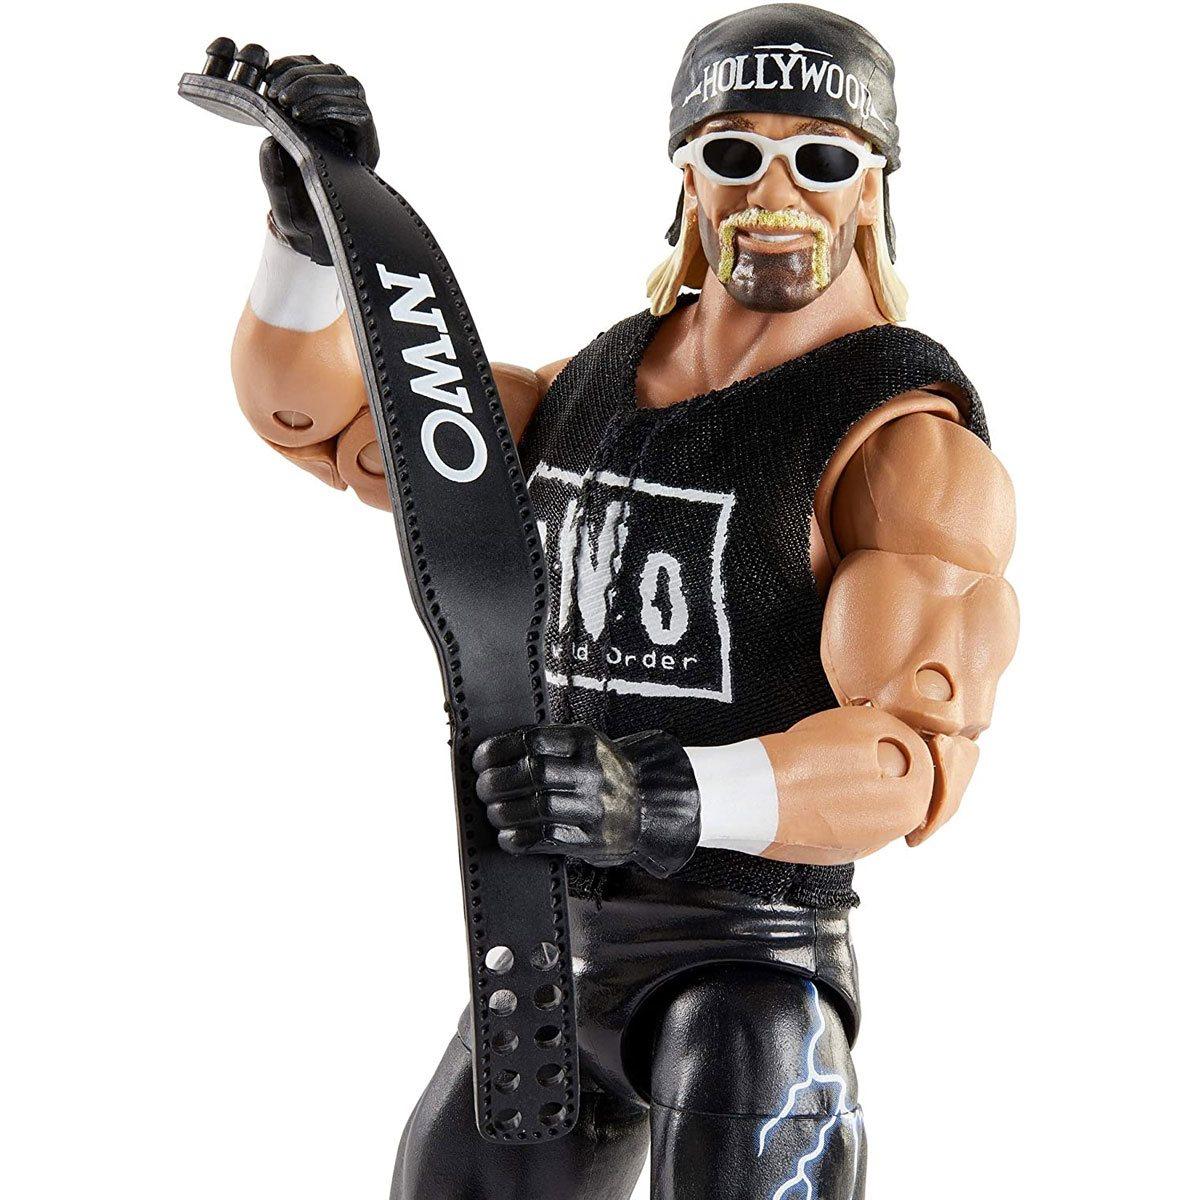 Wwe Ultimate Edition Wave 7 Hollywood Hulk Hogan Action Figure Rerun